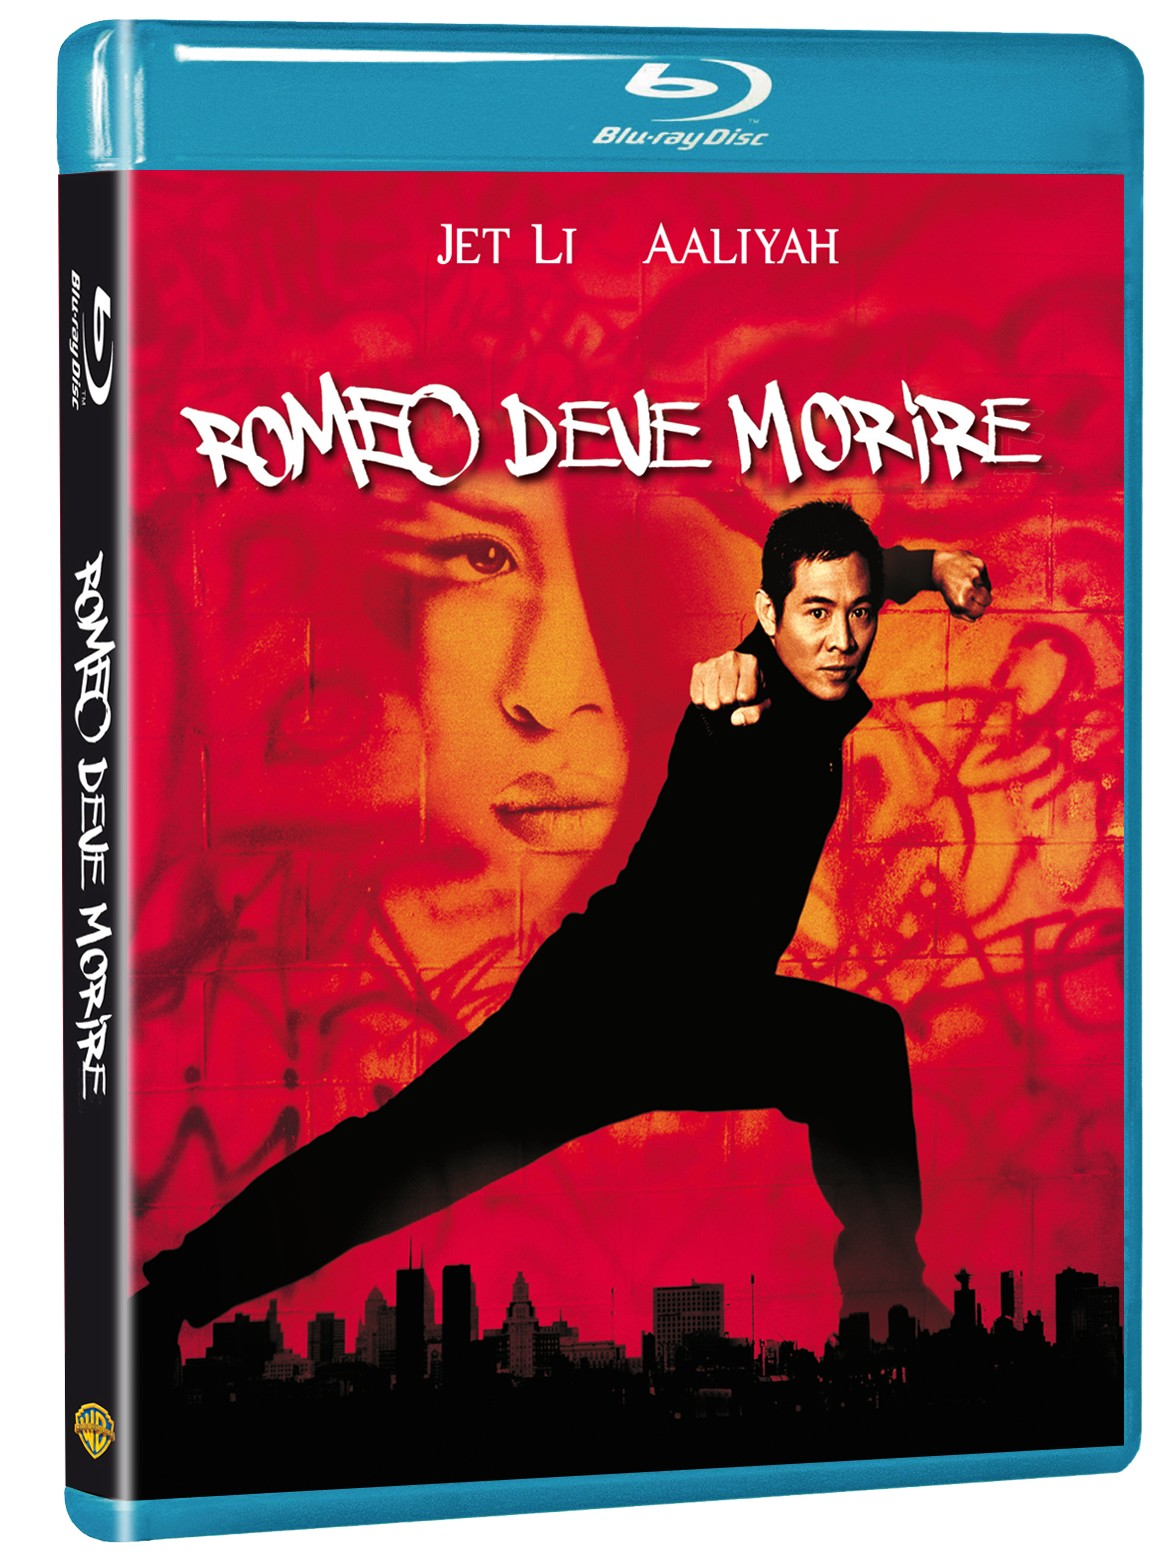 Romeo deve morire blu-ray